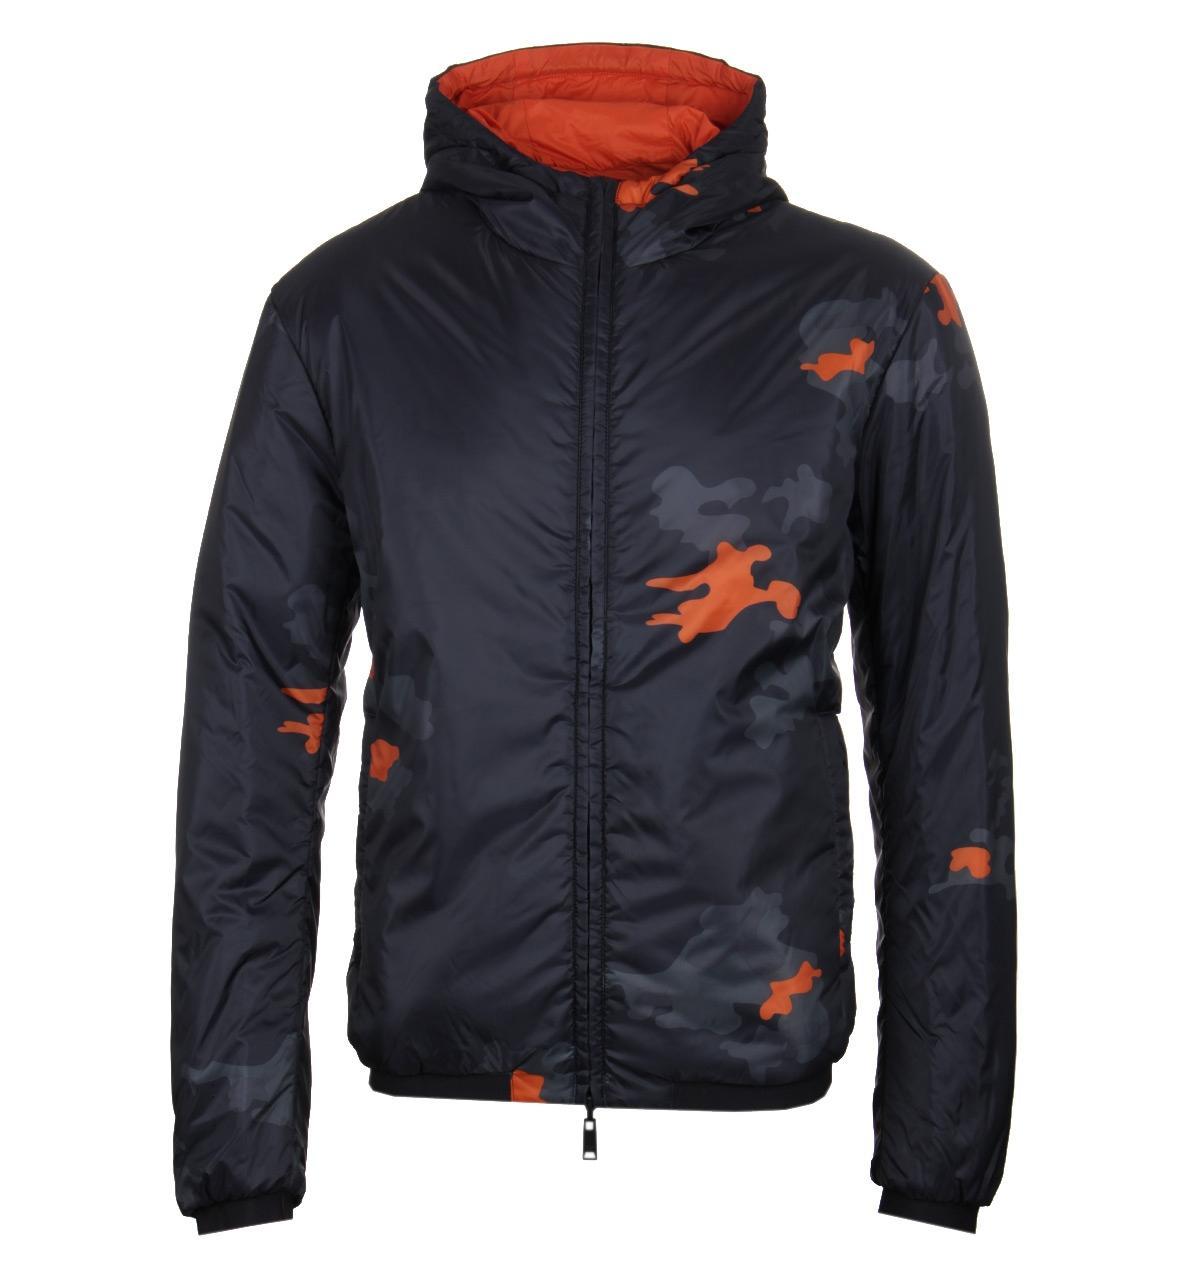 06c7b22b5 Emporio Armani Reversible Camo Black Blouson Jacket in Black for Men ...